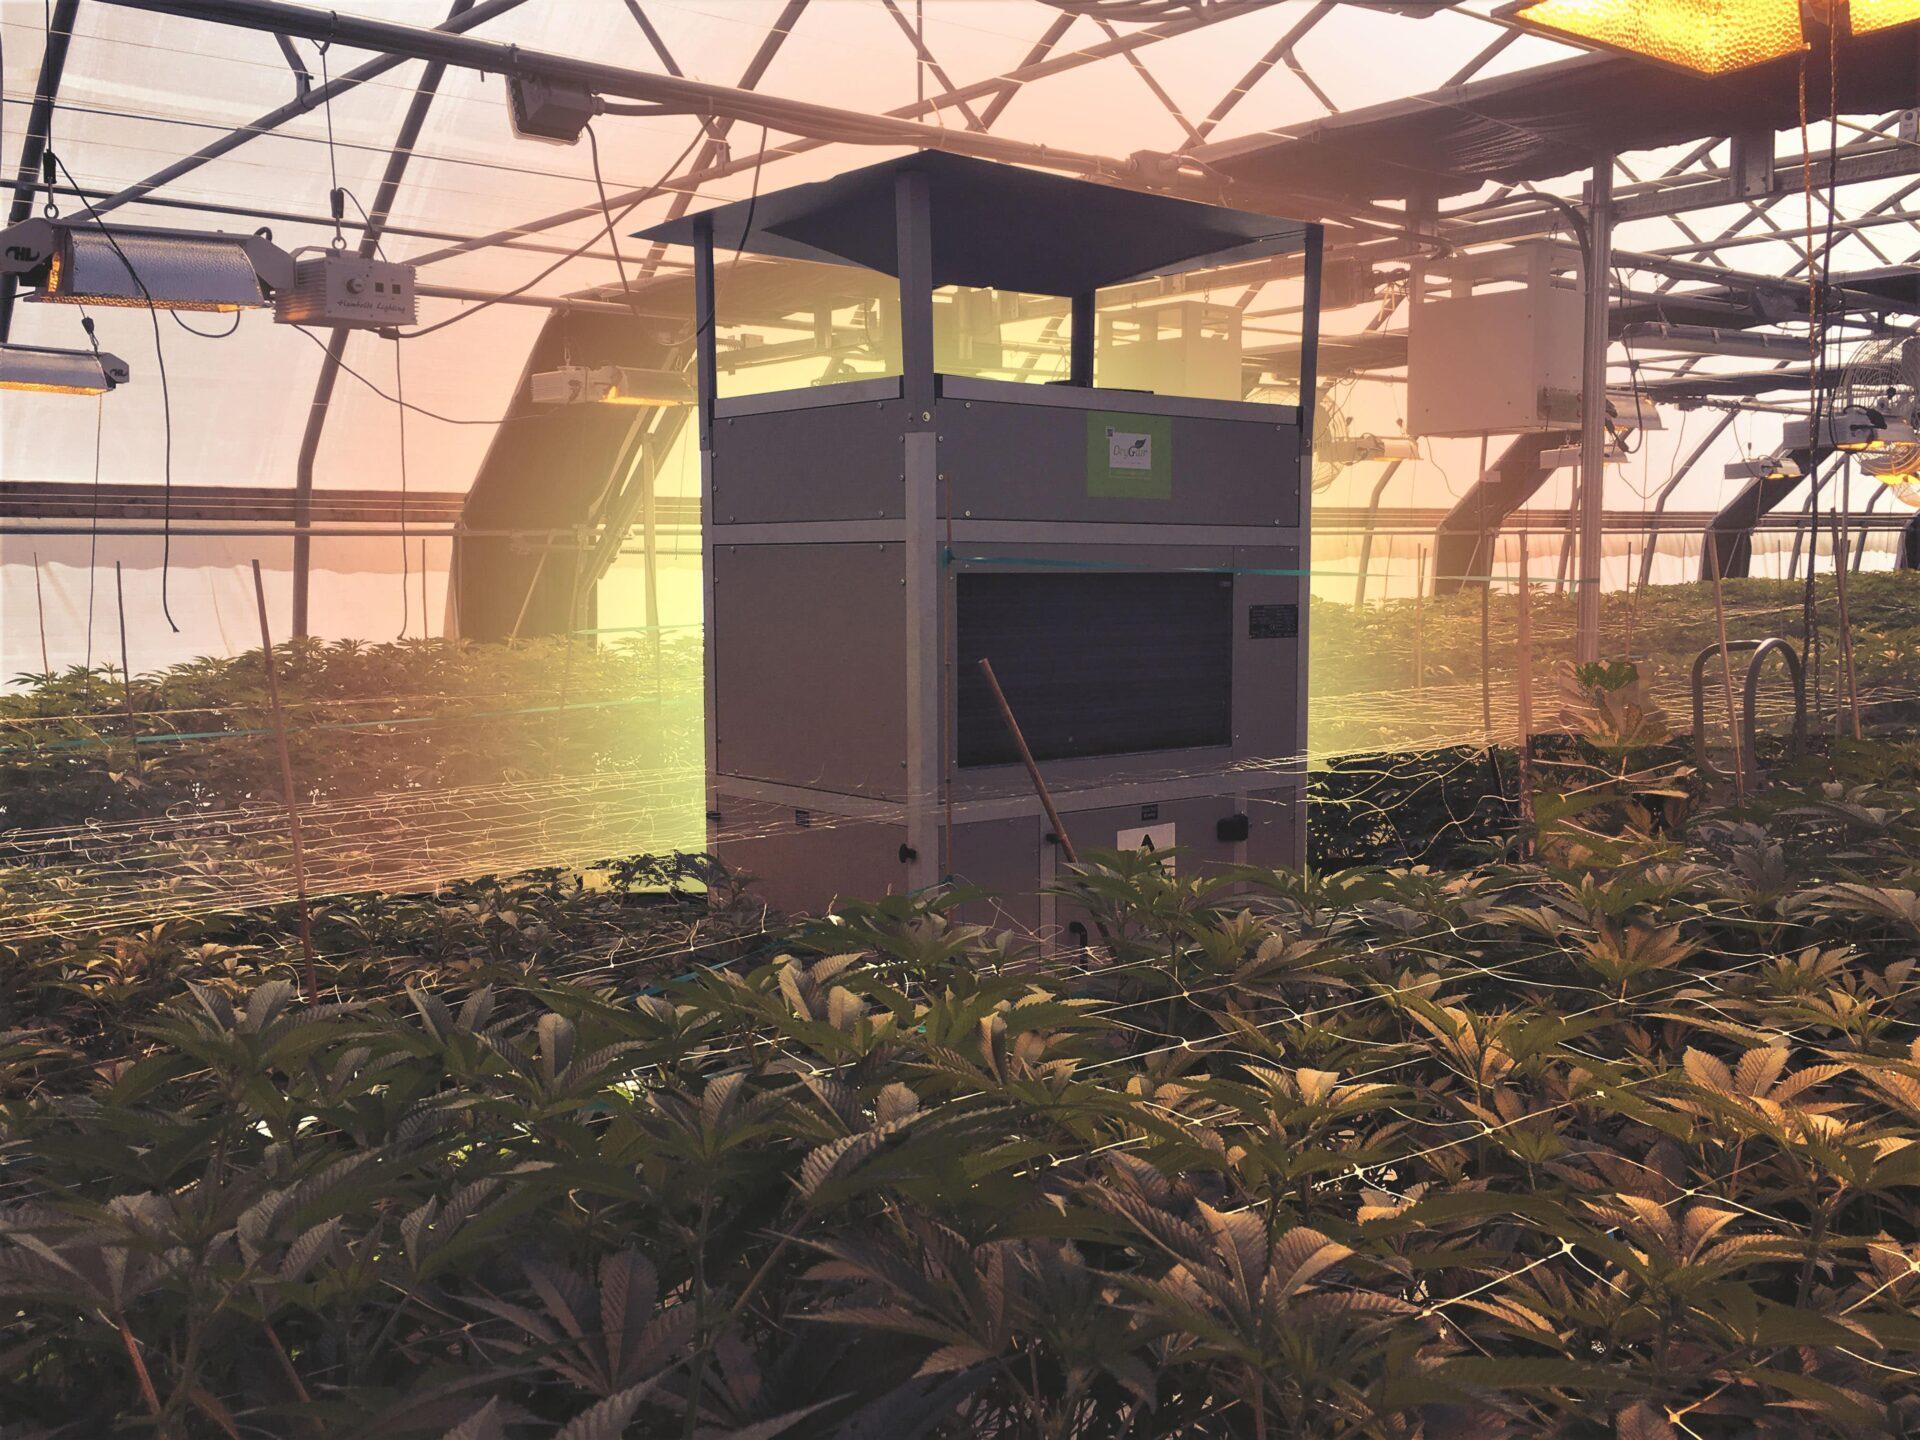 Drygair greenhouse dehumidifier plants